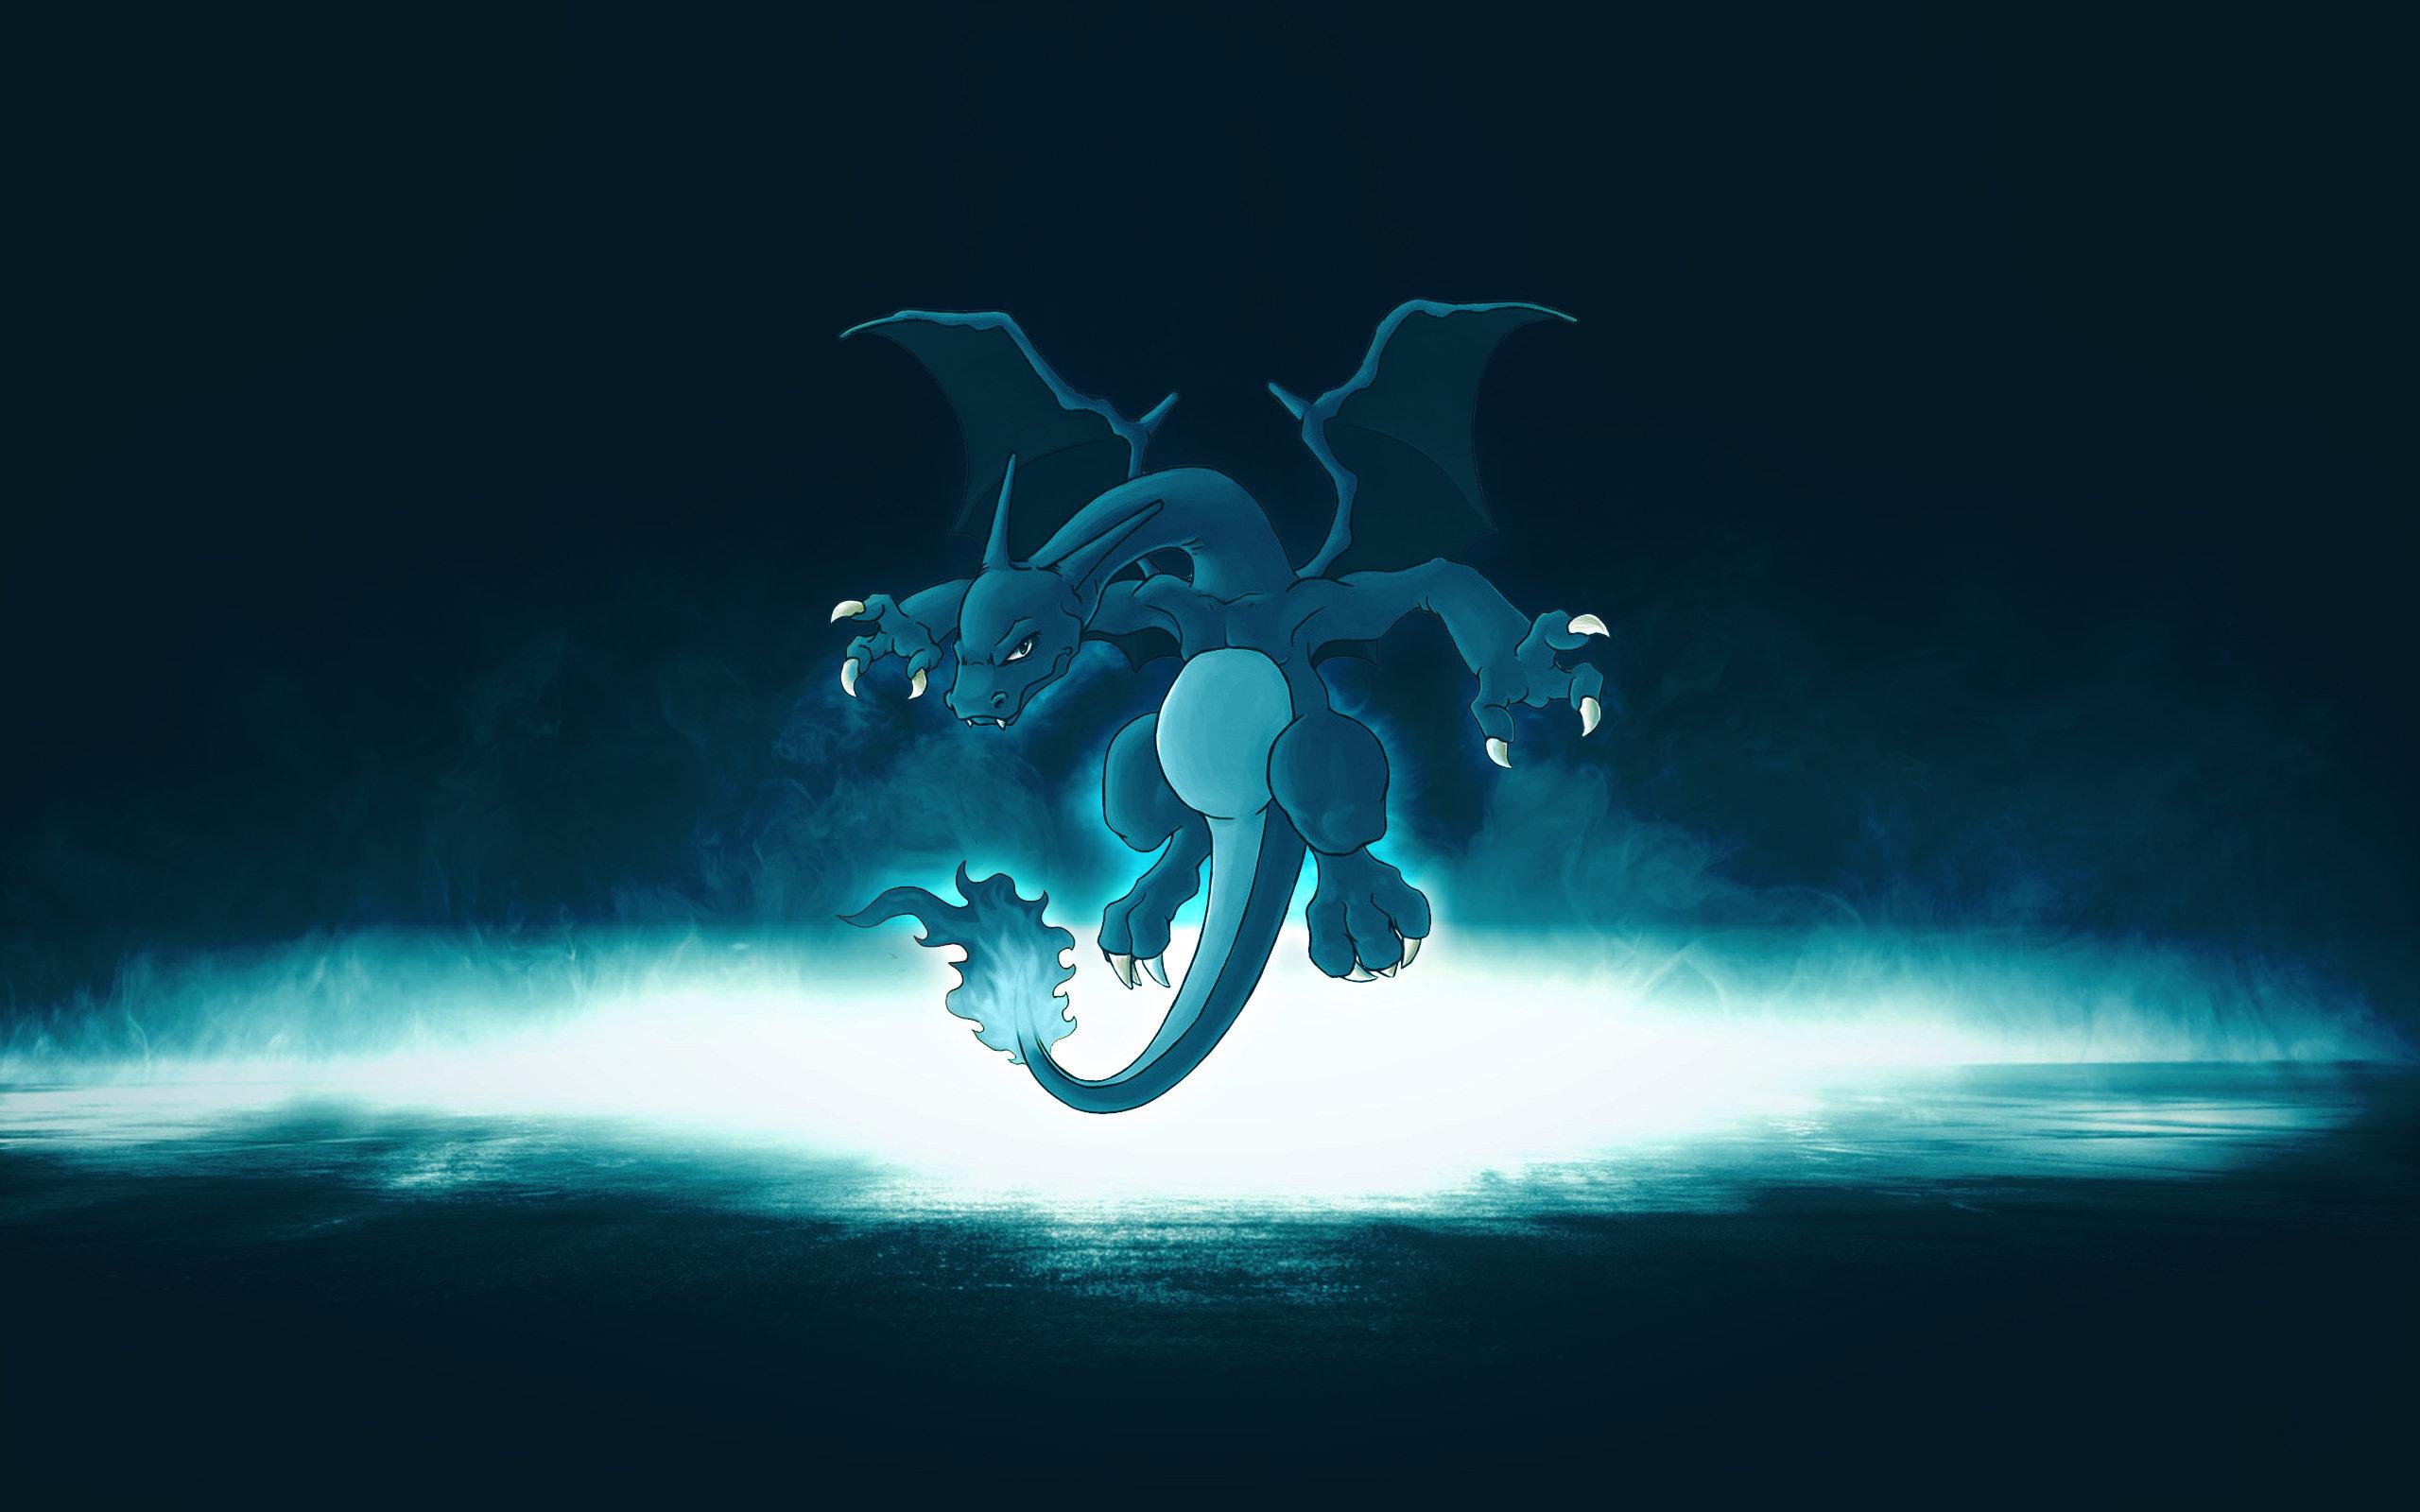 high resolution charizard (pokemon) hd 2560x1600 wallpaper id:278707